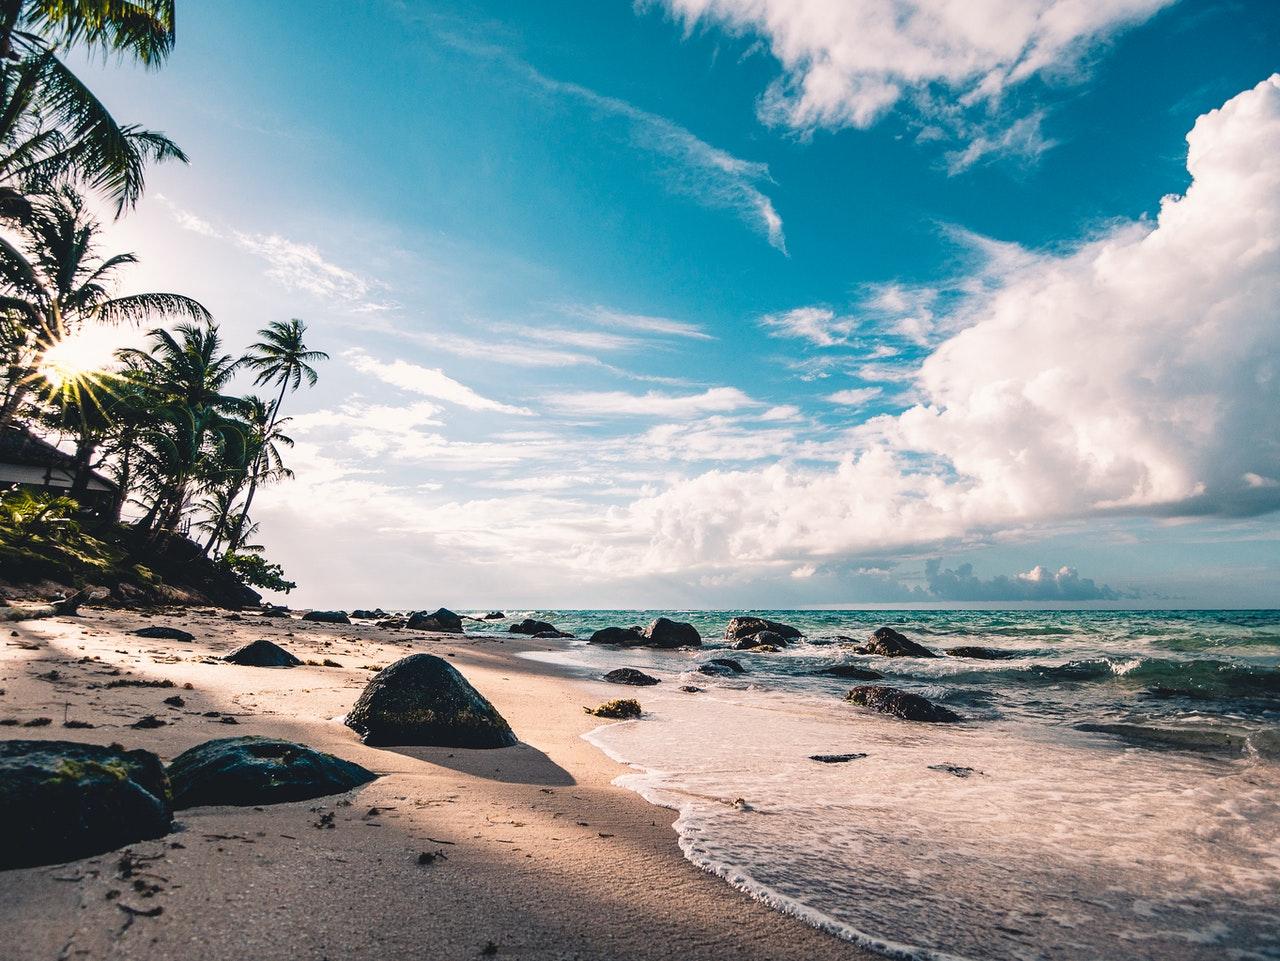 Exploring Deception Island